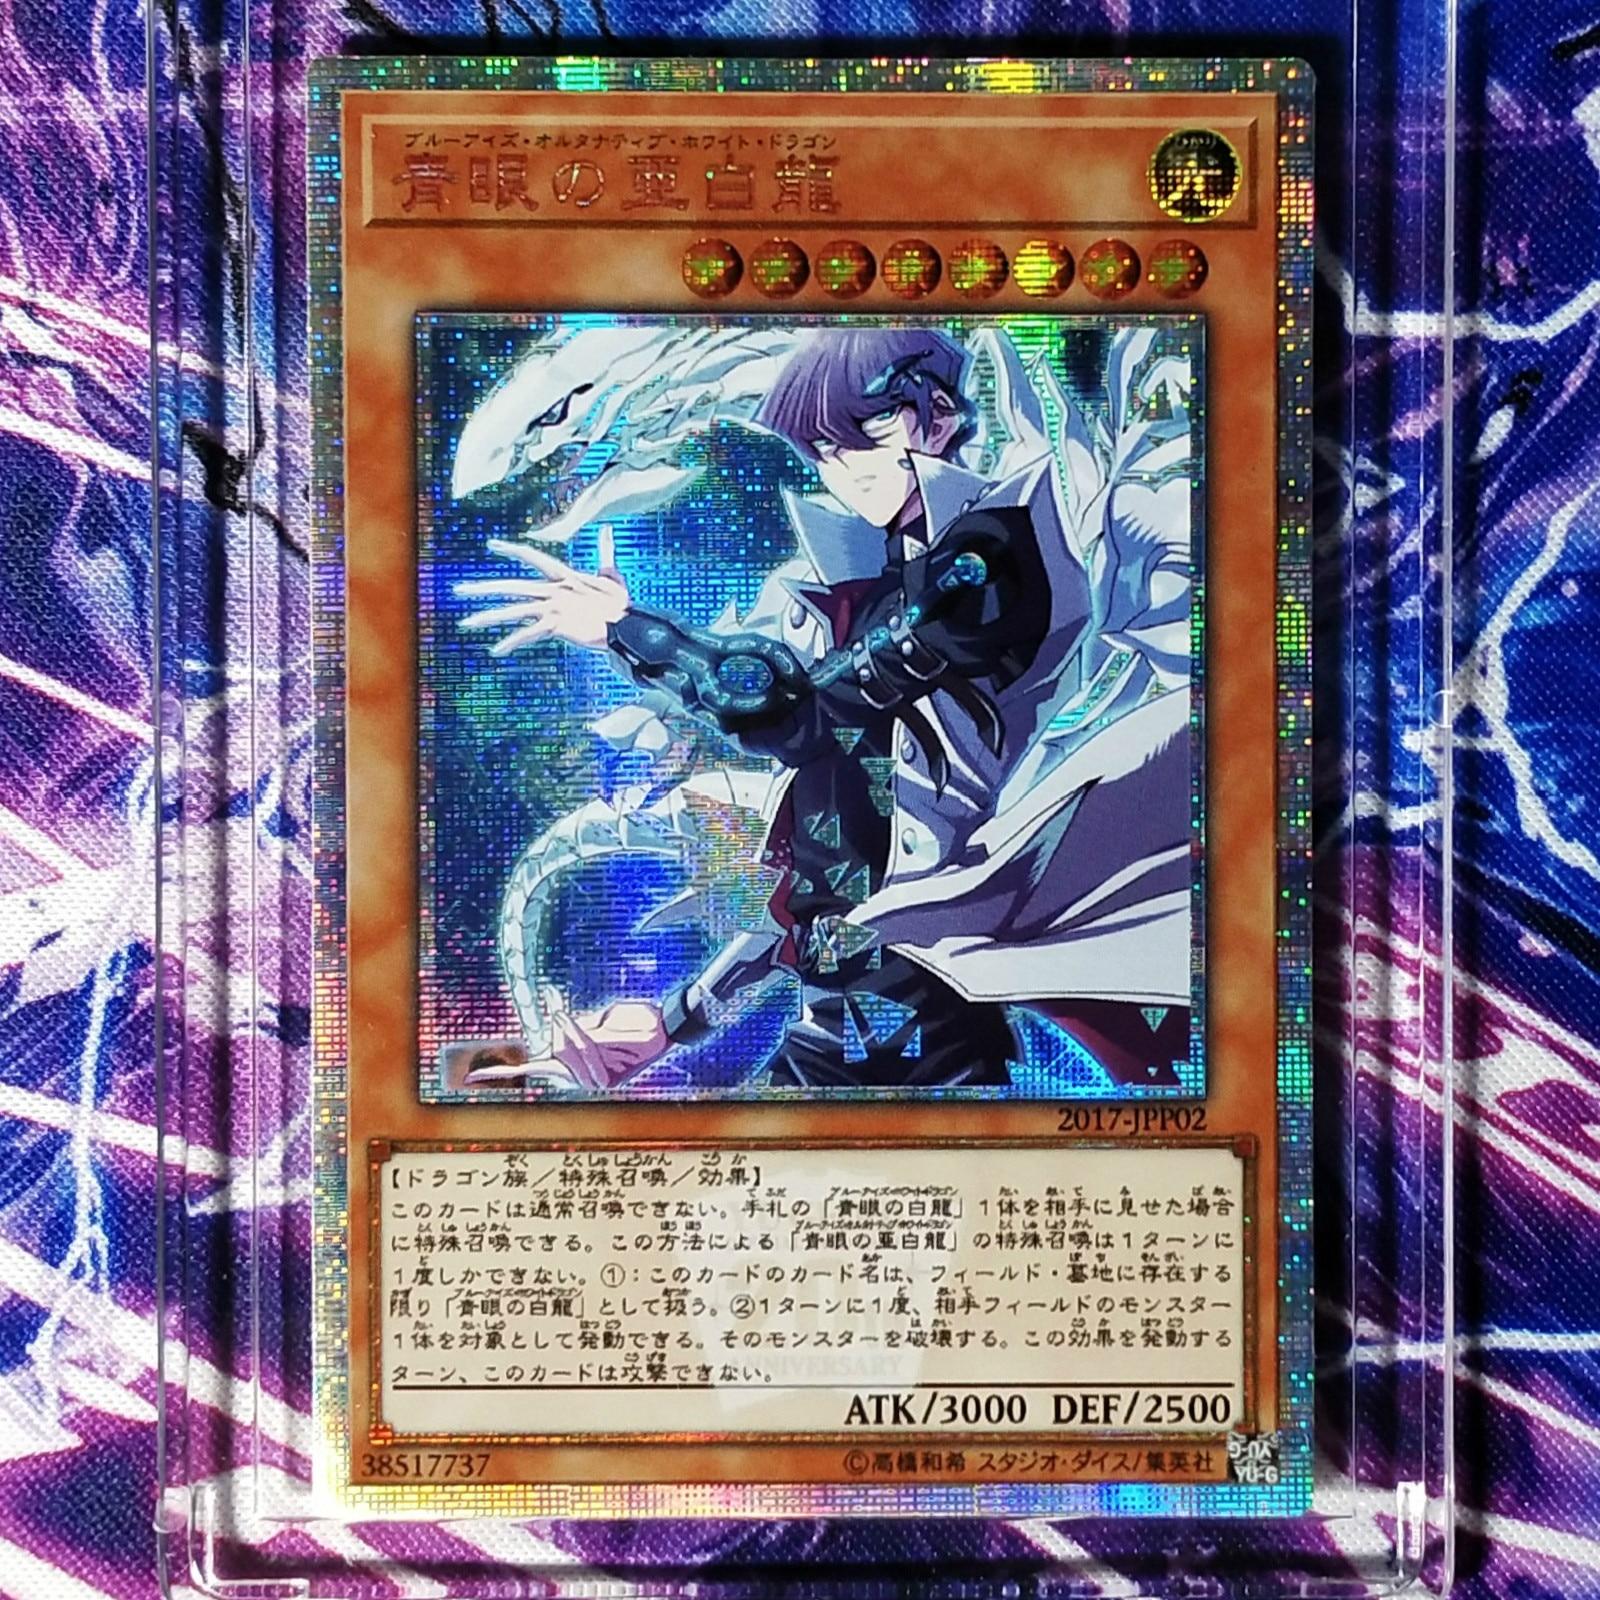 Yu Gi Oh Blue Eyes White Dragon Seto Kaiba DIY Colorful Toys Hobbies Hobby Collectibles Game Collection Anime Cards